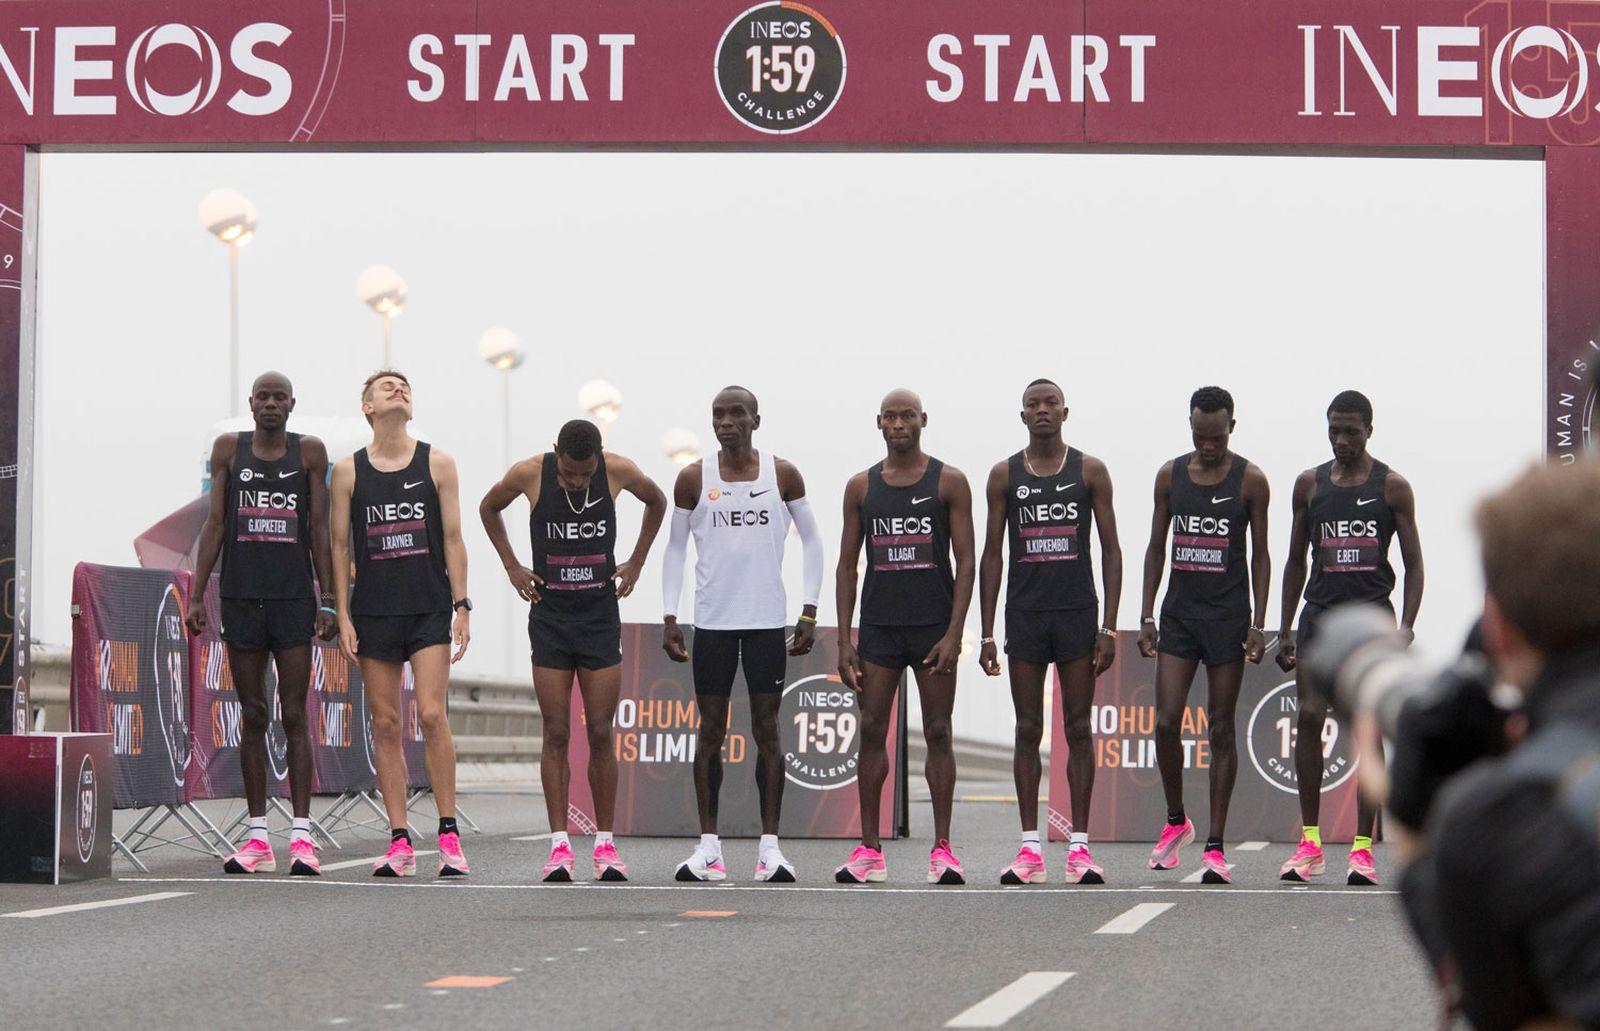 eliud kipchoge marathon record pictures Nike